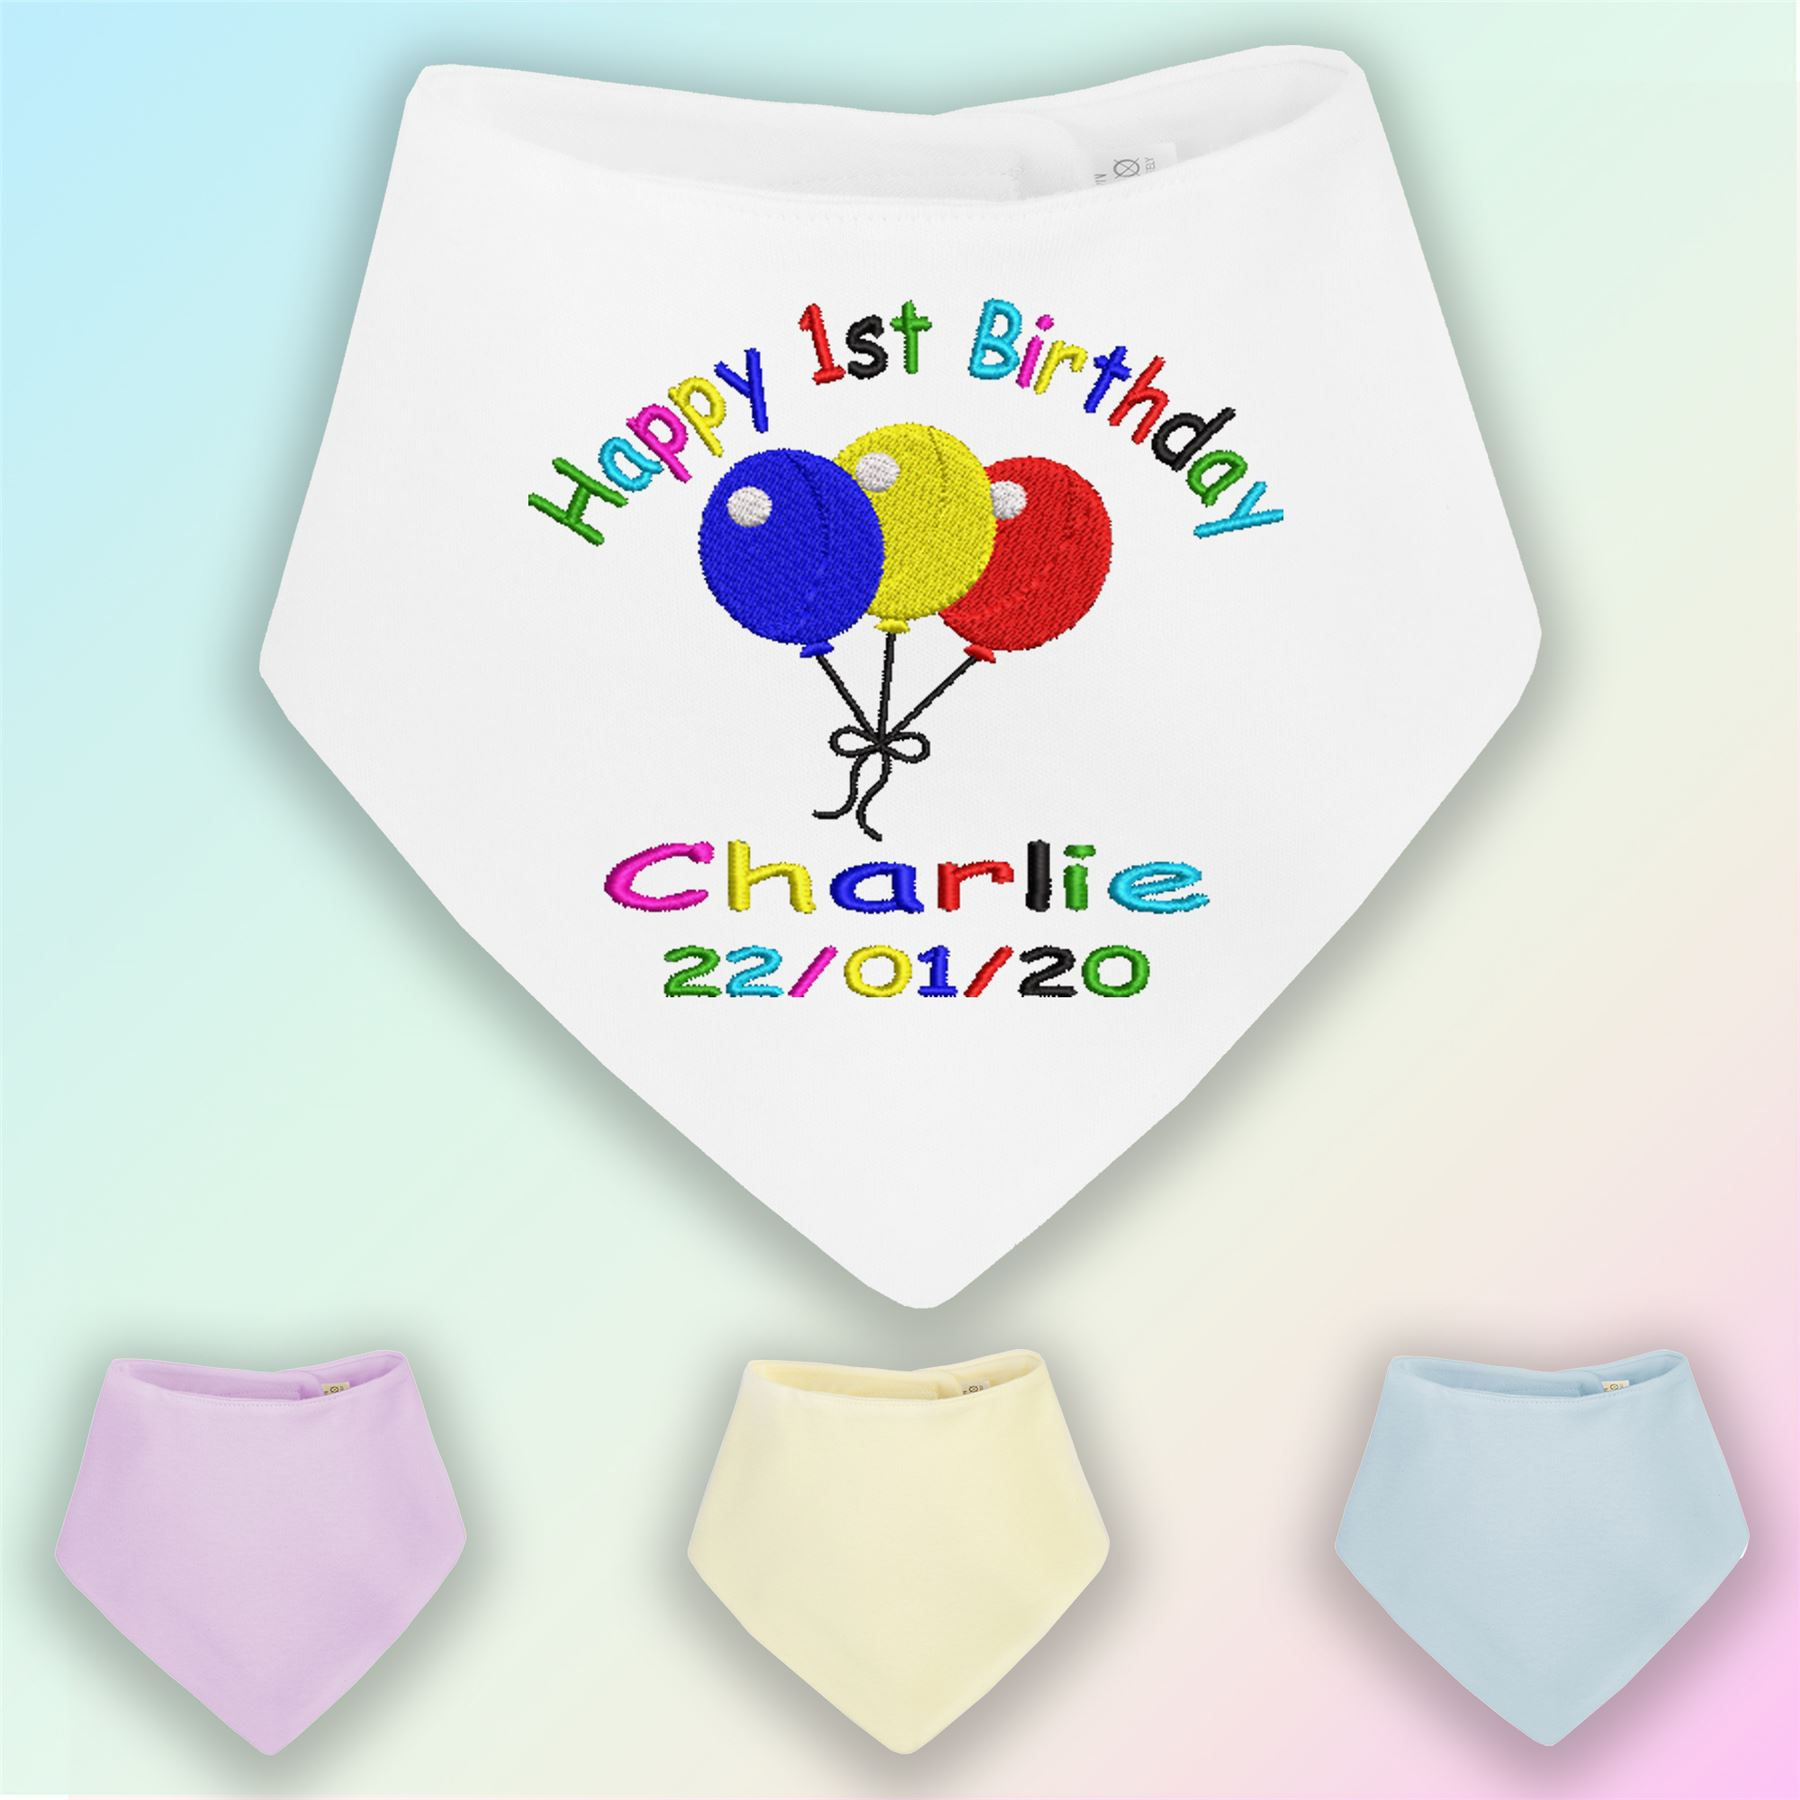 Happy 1st Birthday Boy Embroidered Baby Bandana Dribble Bib Gift Personalised